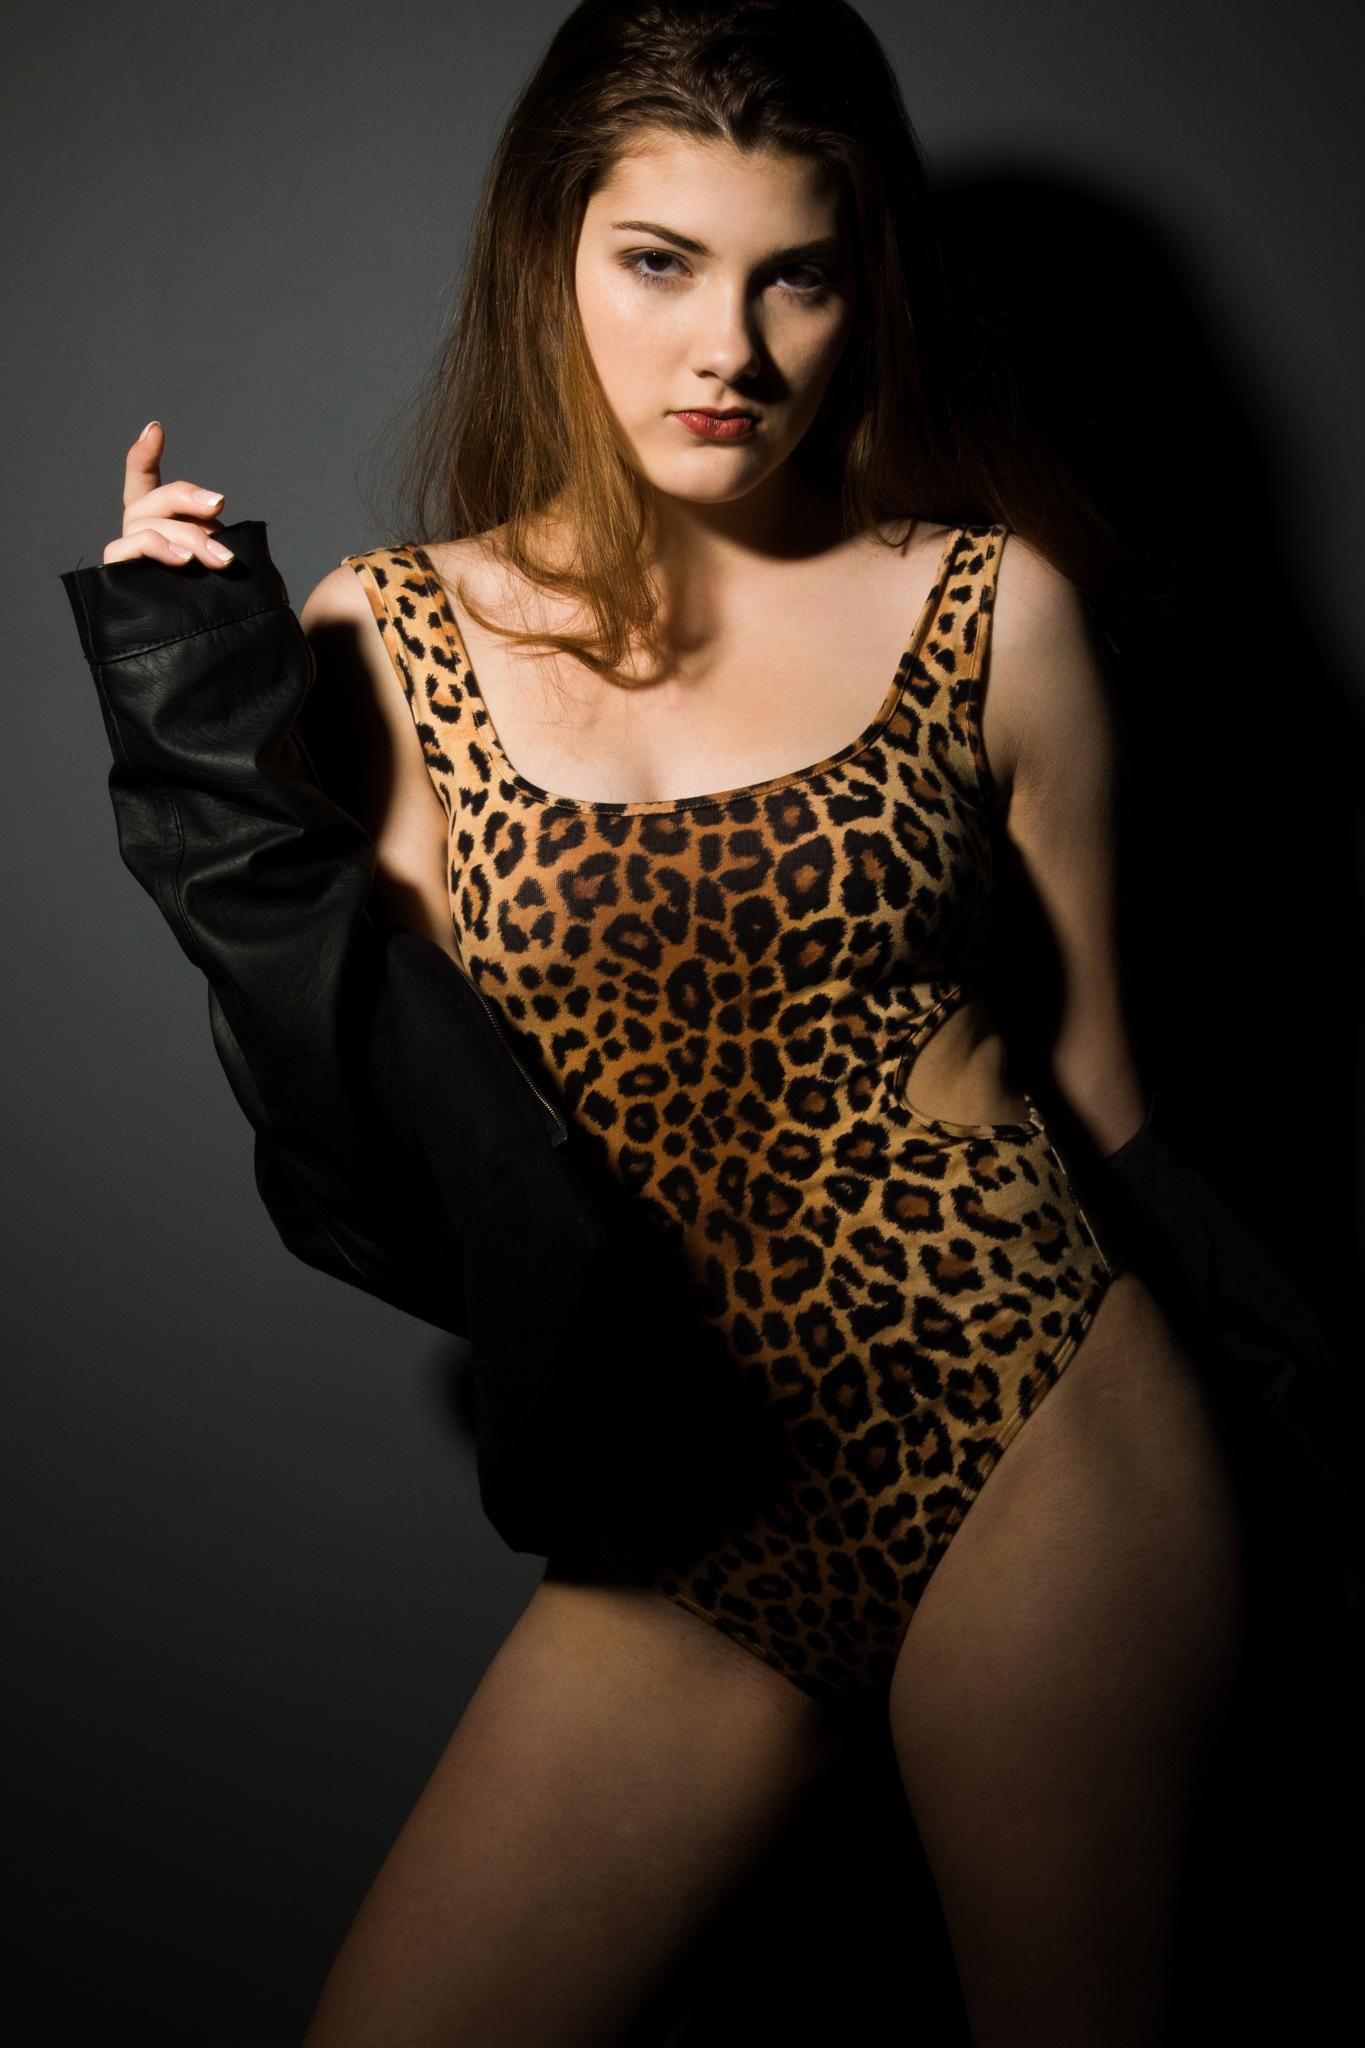 Mac the Leopard by Scott Doner